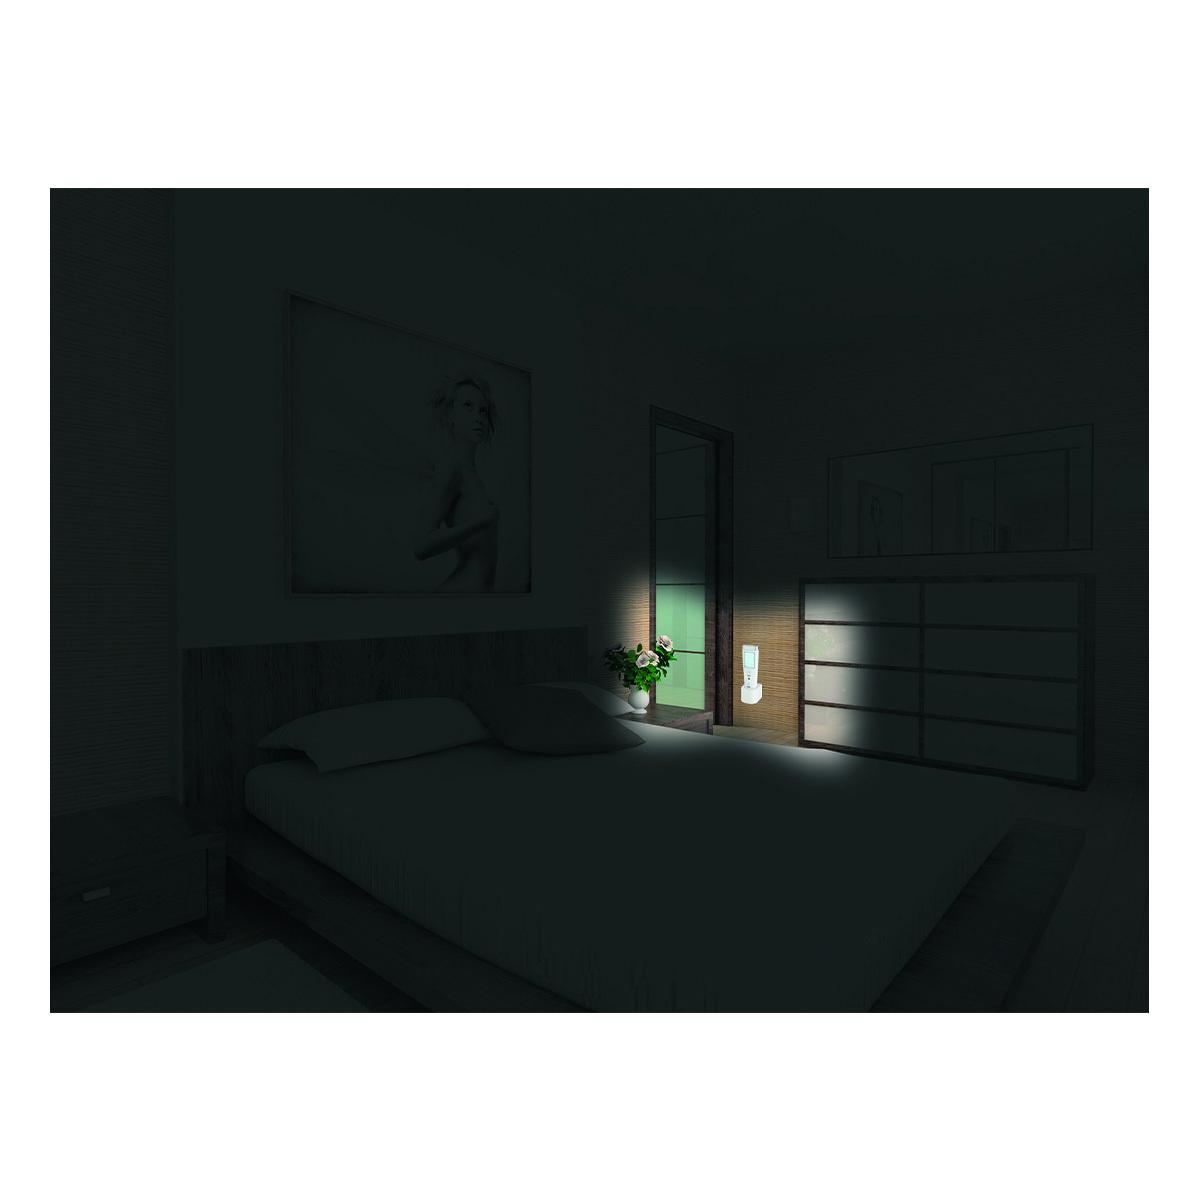 43-2033-led-multi-funktions-sicherheitslampe-lumatic-guard-anwendung2-1200x1200px.jpg